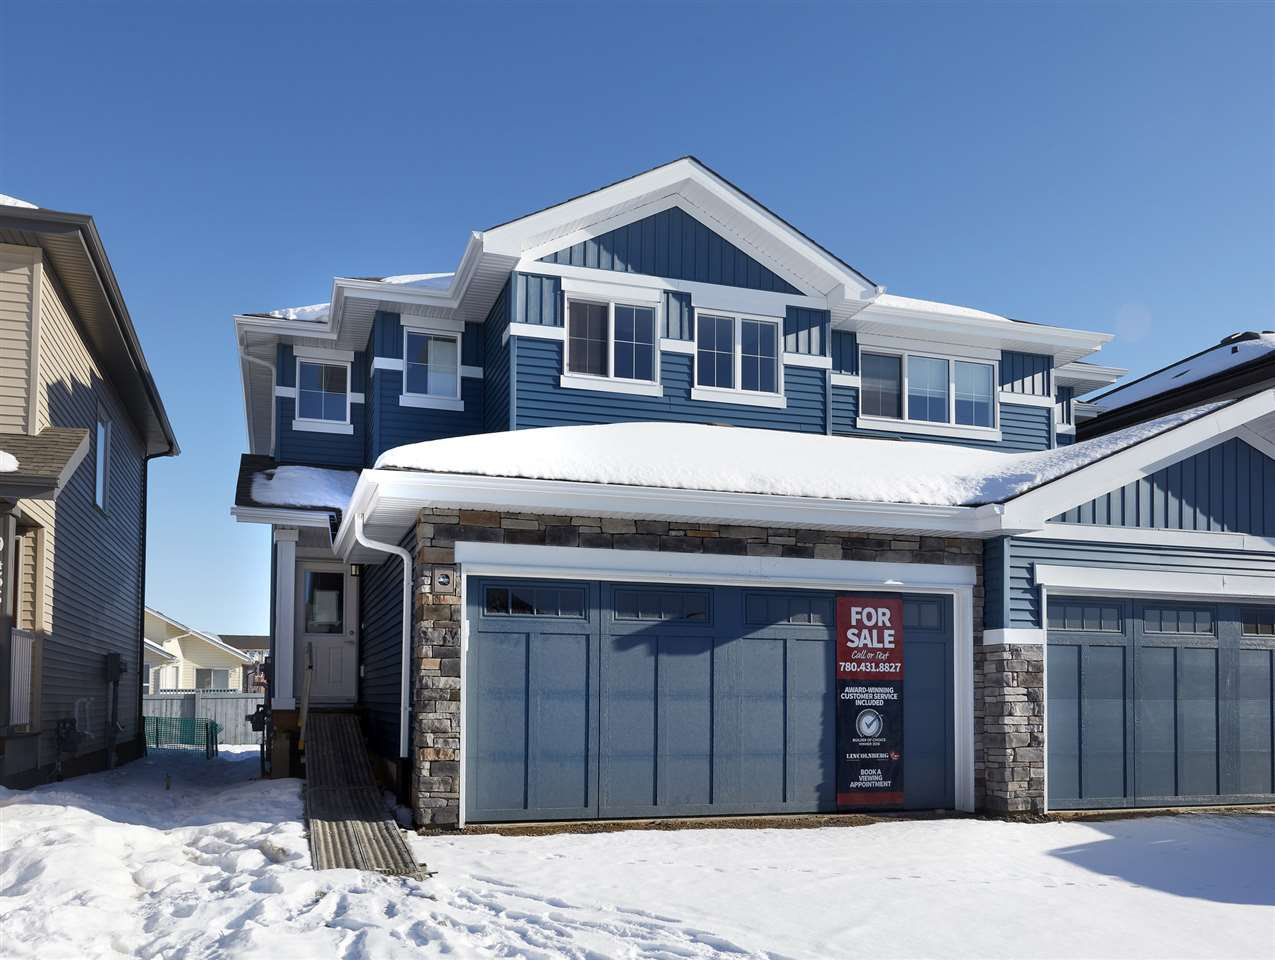 Main Photo: 9431 209 Street in Edmonton: Zone 58 House Half Duplex for sale : MLS®# E4187023